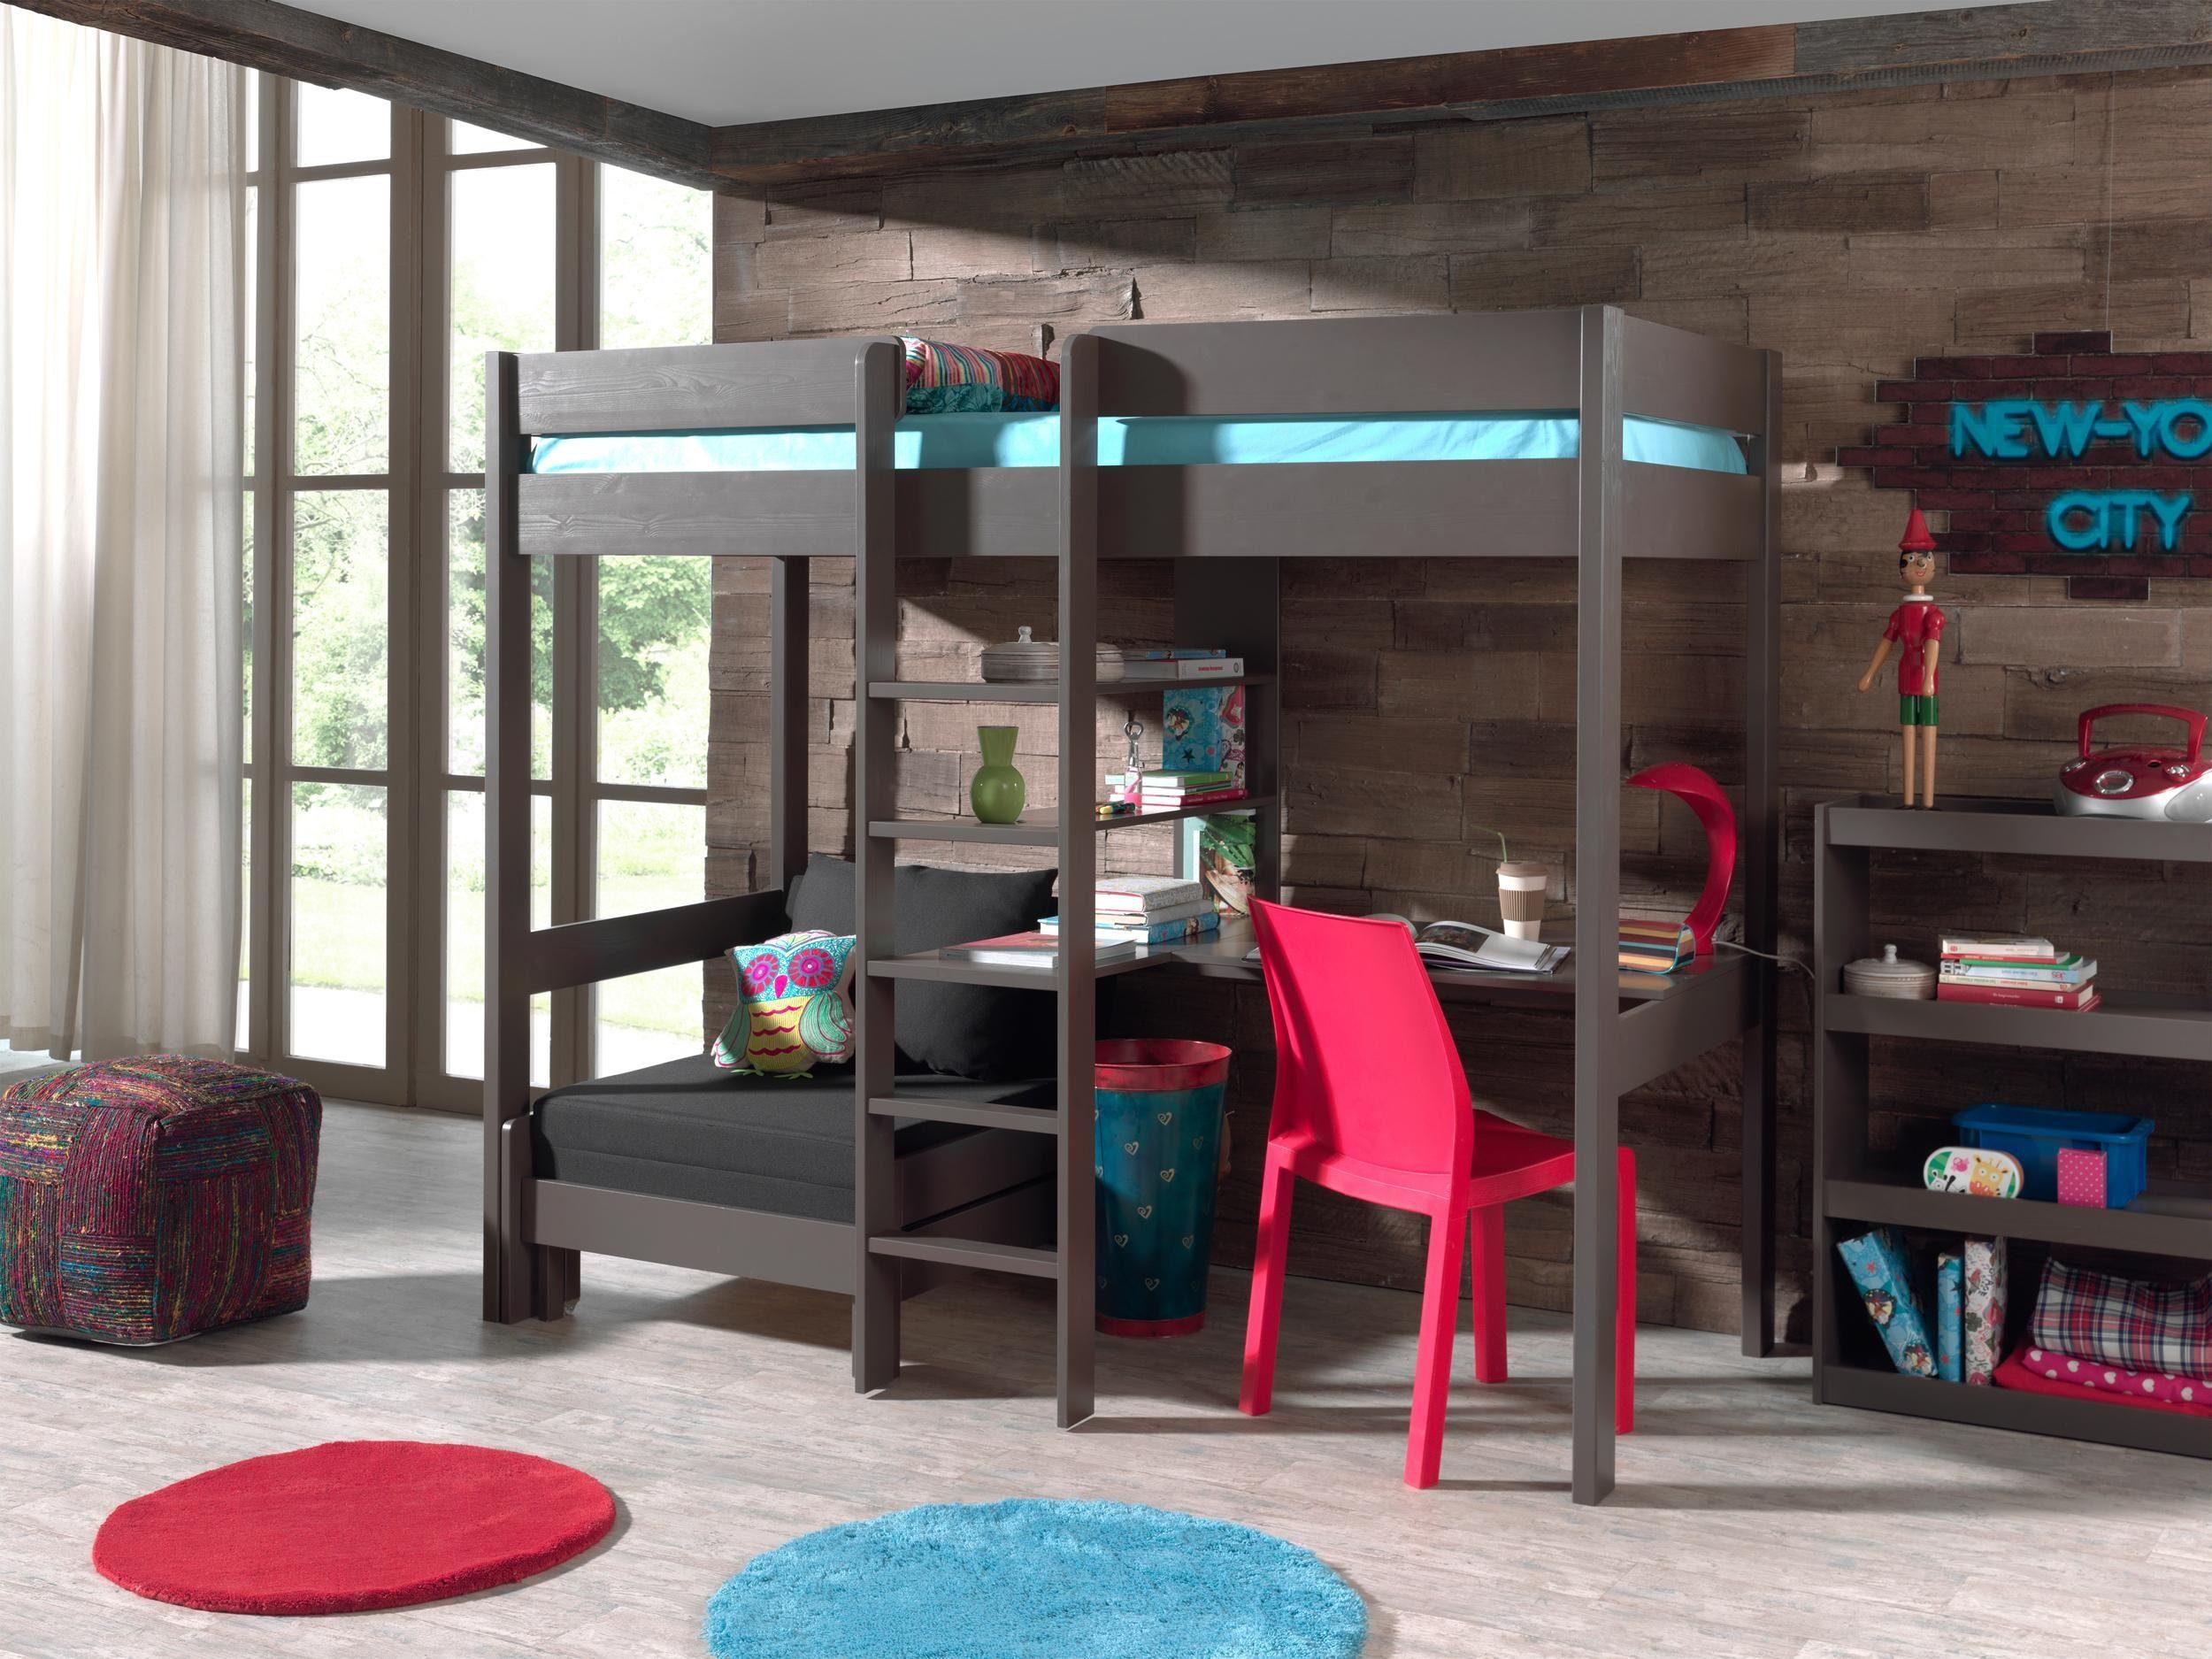 Etagenbett Pino : Vipack furniture hochbett pino« inkl rolllattenrost